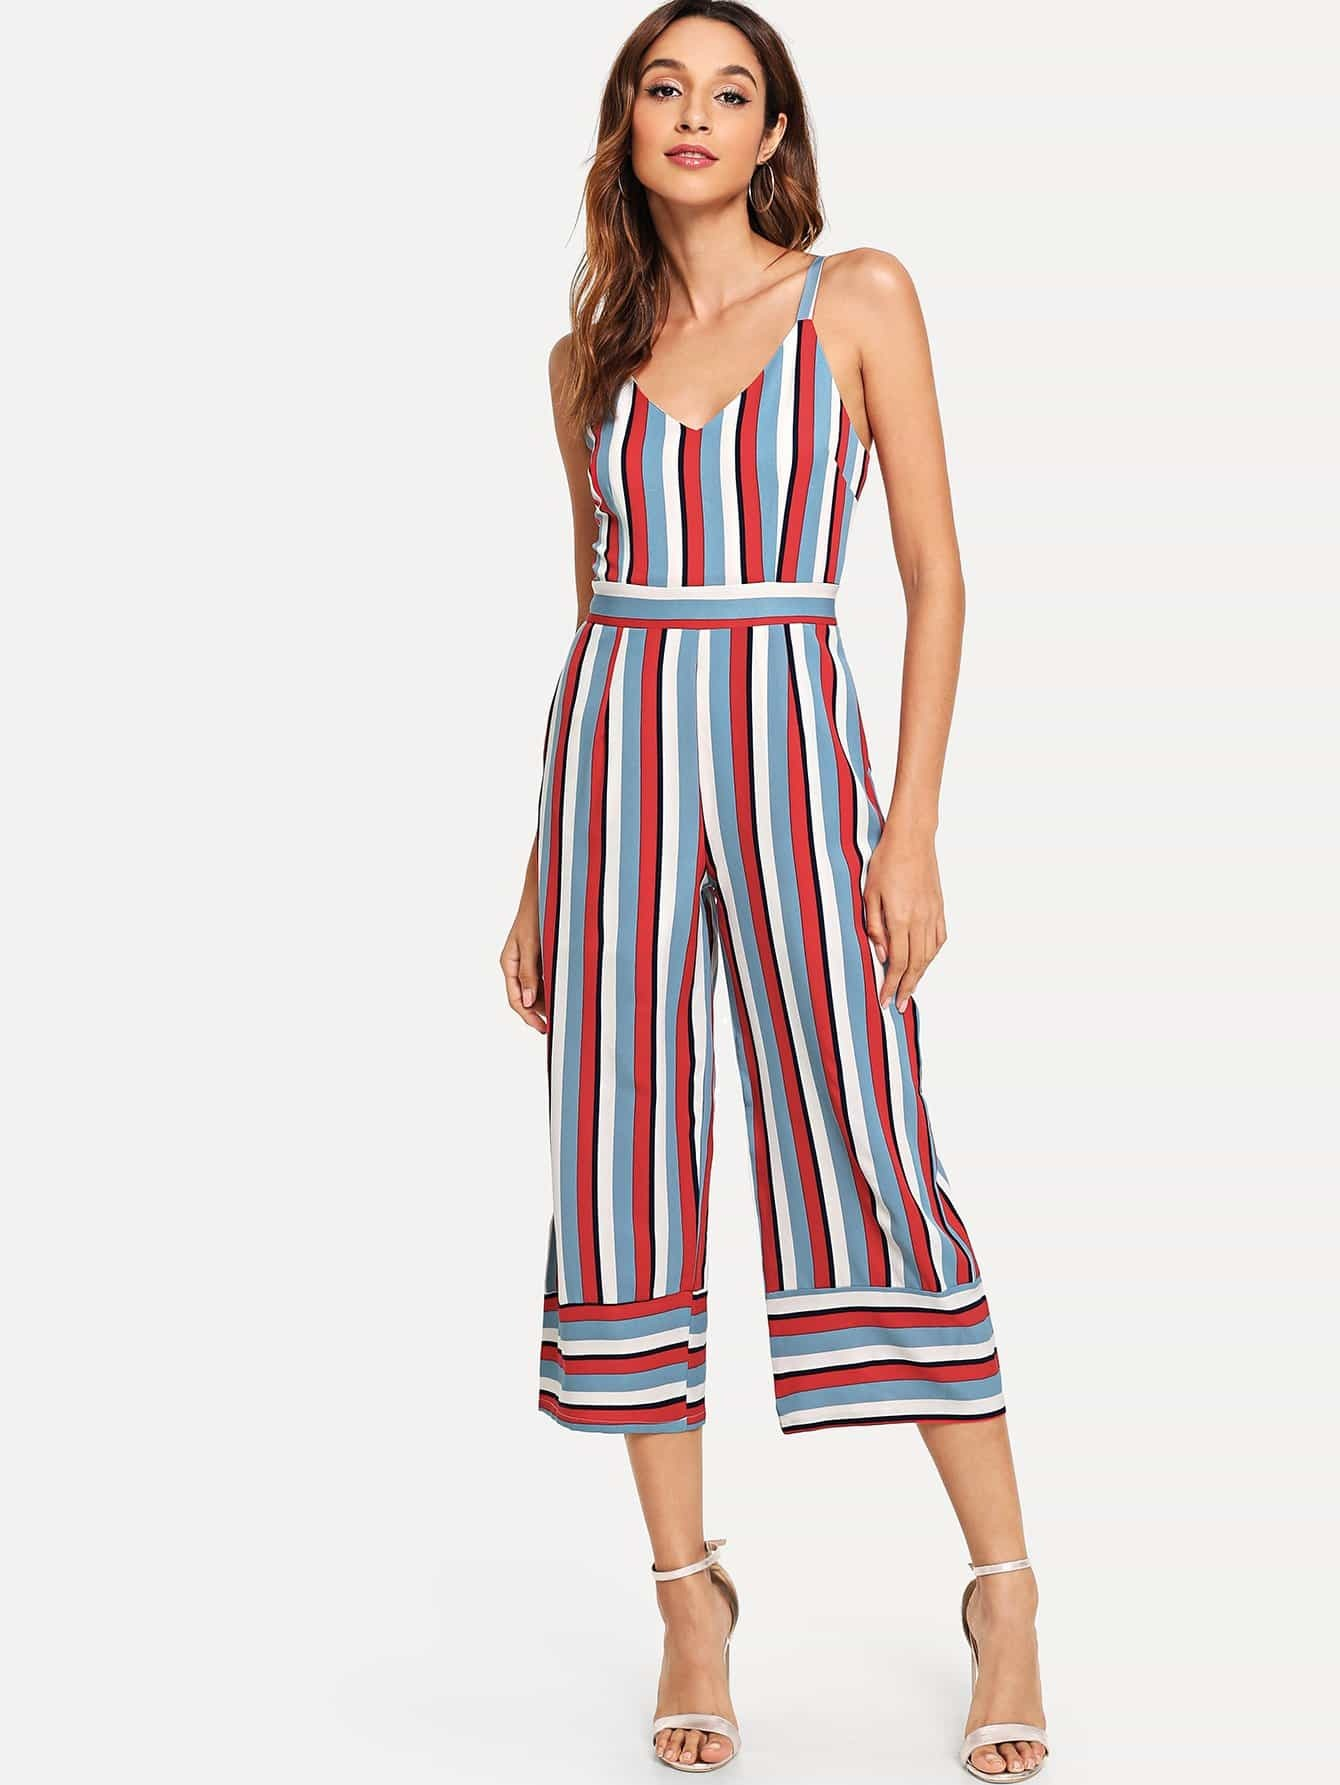 Colorful Striped Cami Romper